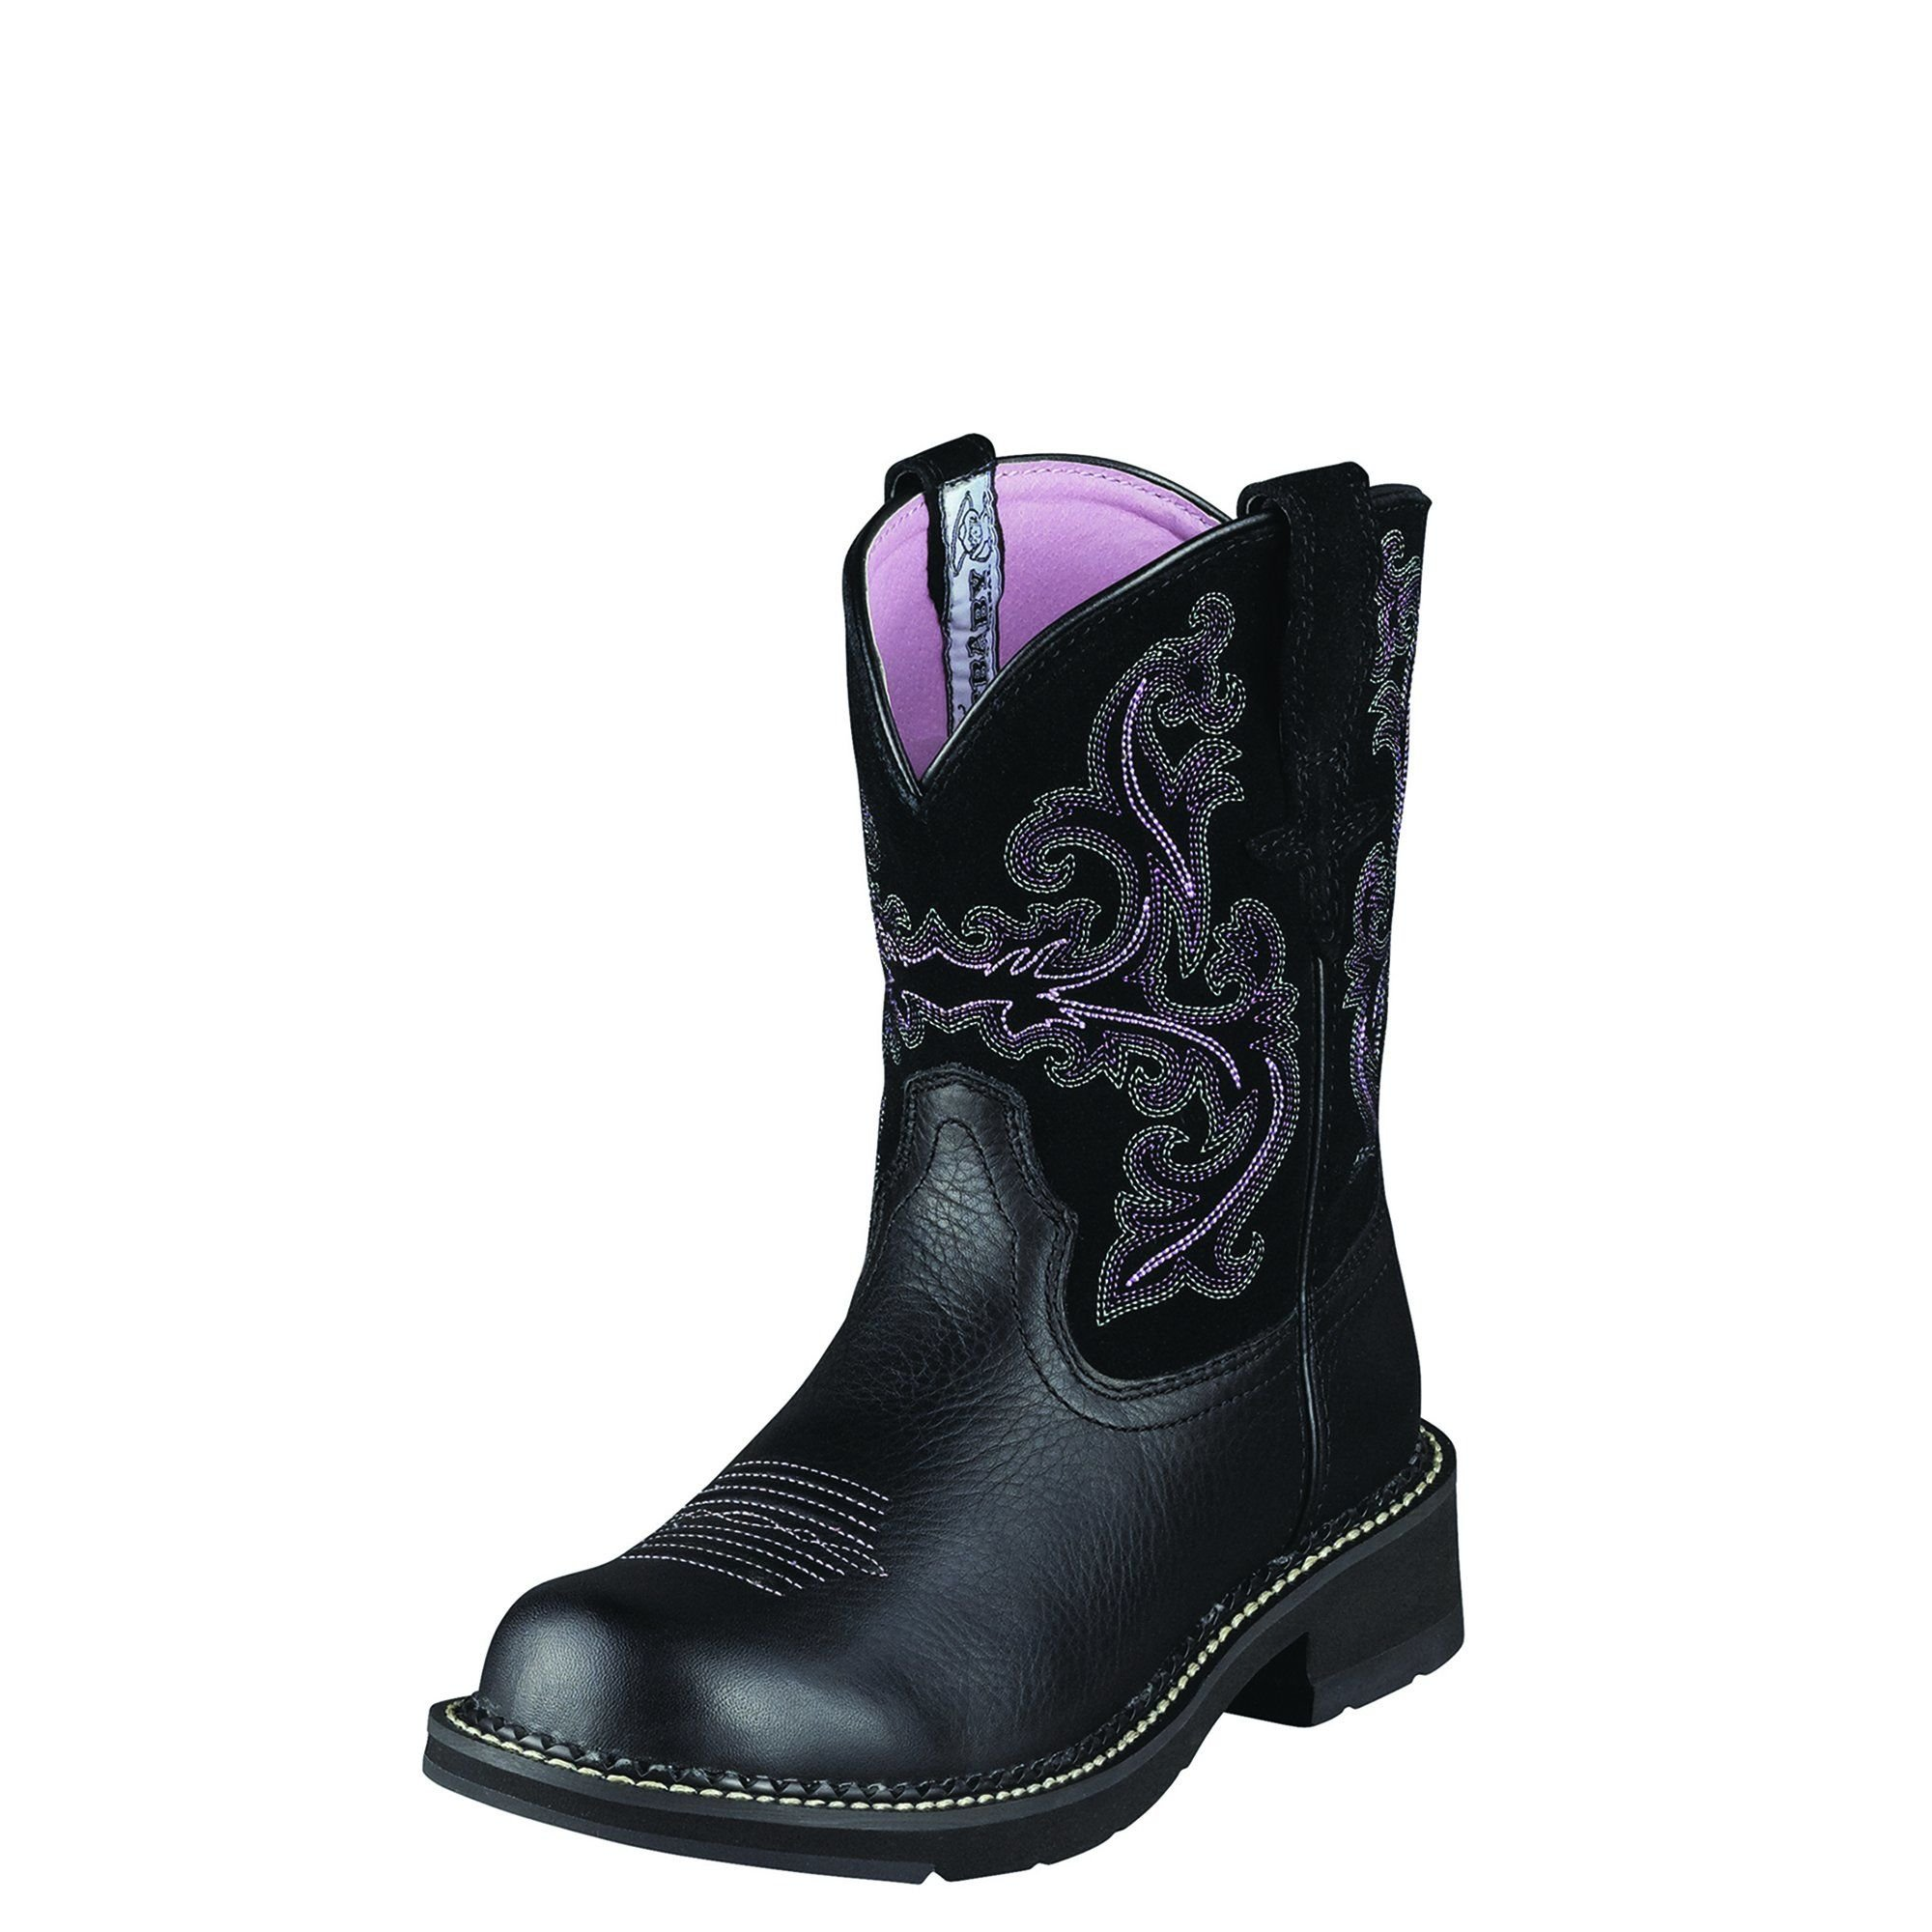 ARIAT WOMEN Fatbaby II Western Cowboy Boot, Black Deertan/Orchid, 10 M US